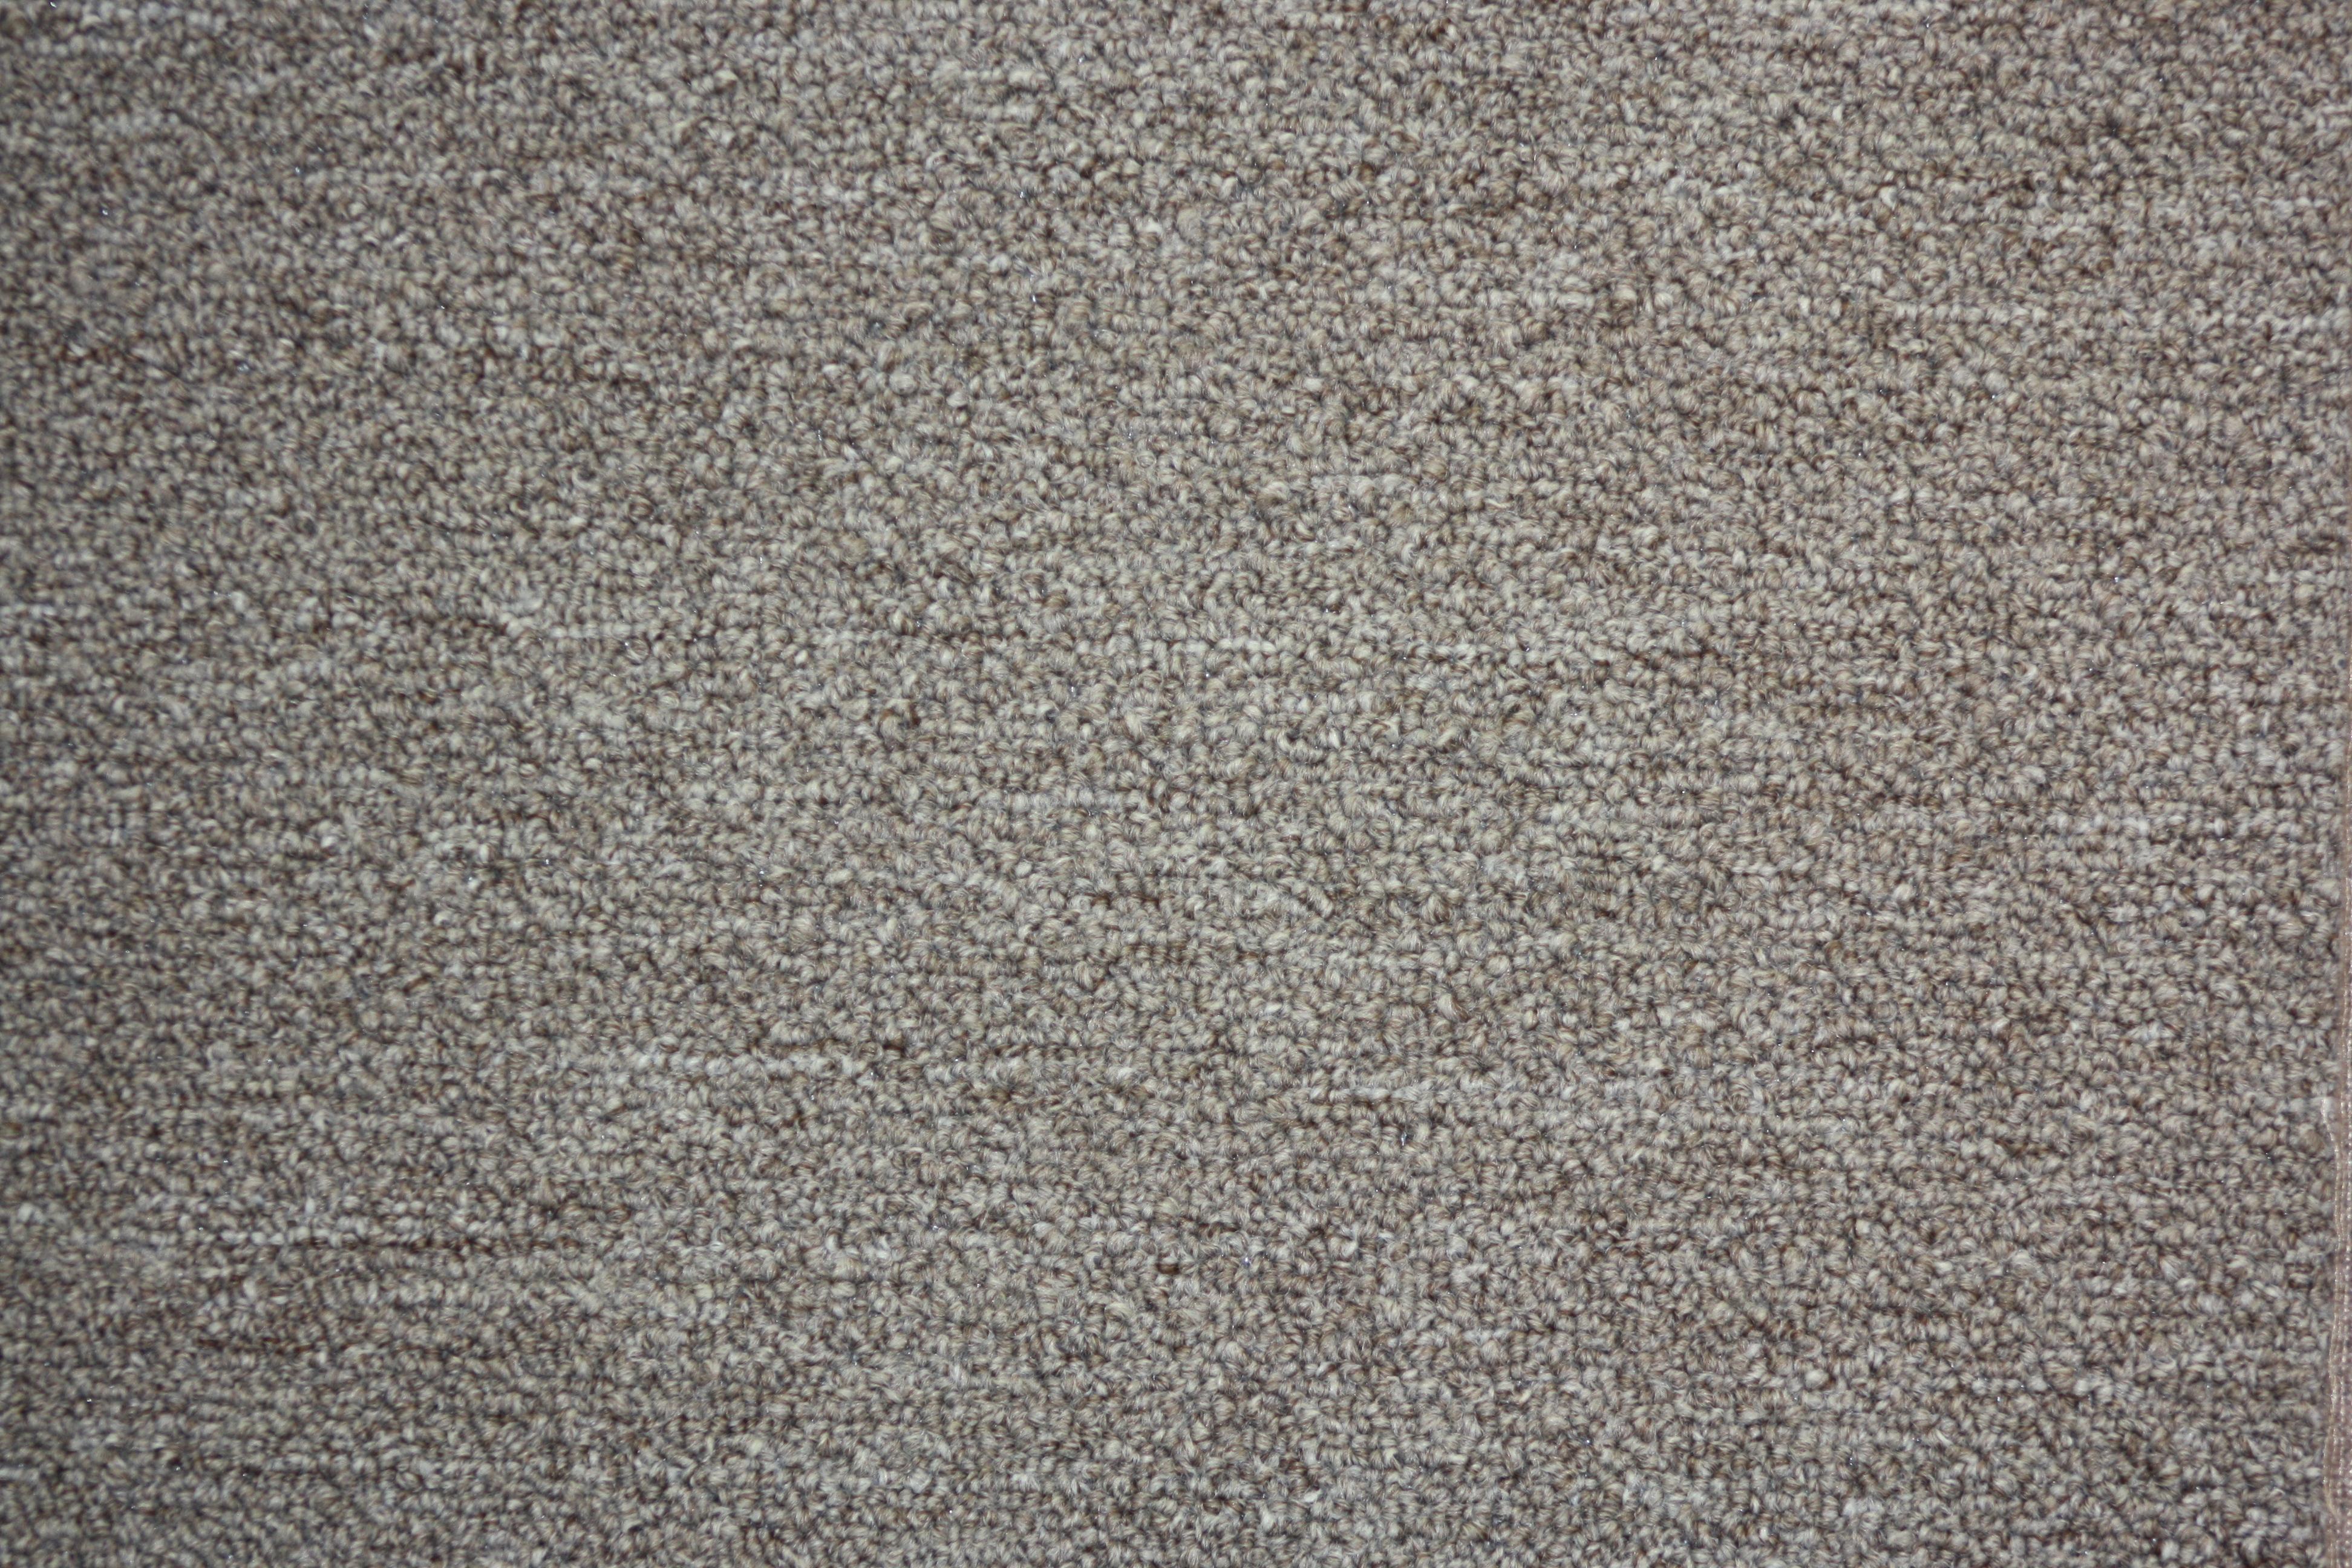 carpet texture carpet floor texture DIEFMPH